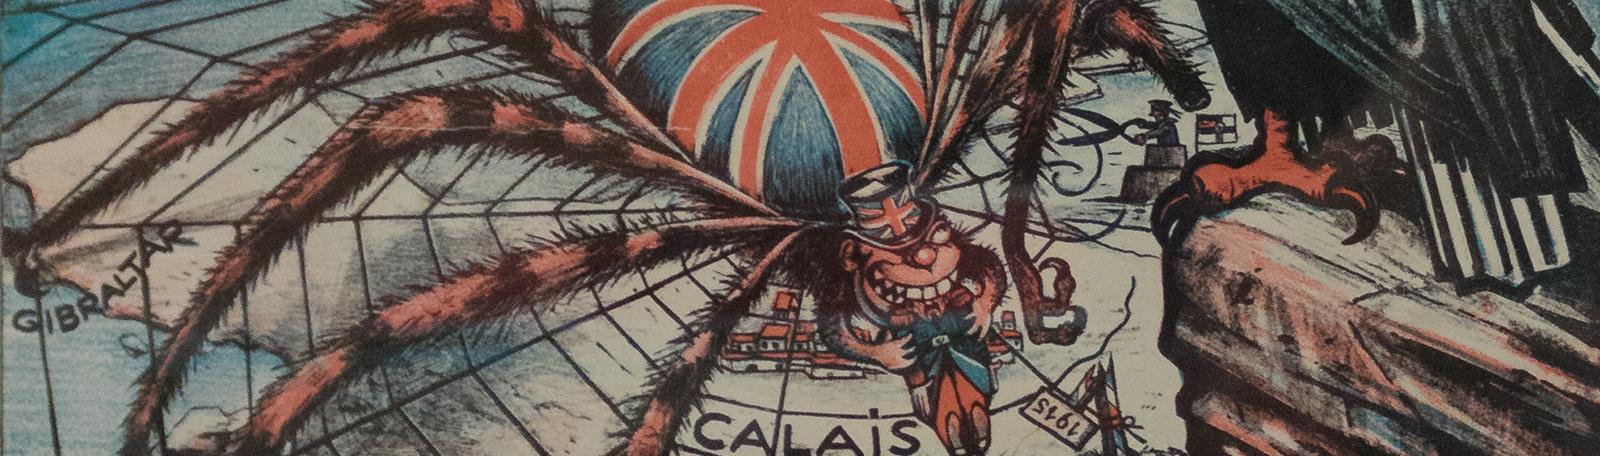 War theme banner - L'Entente cordiale